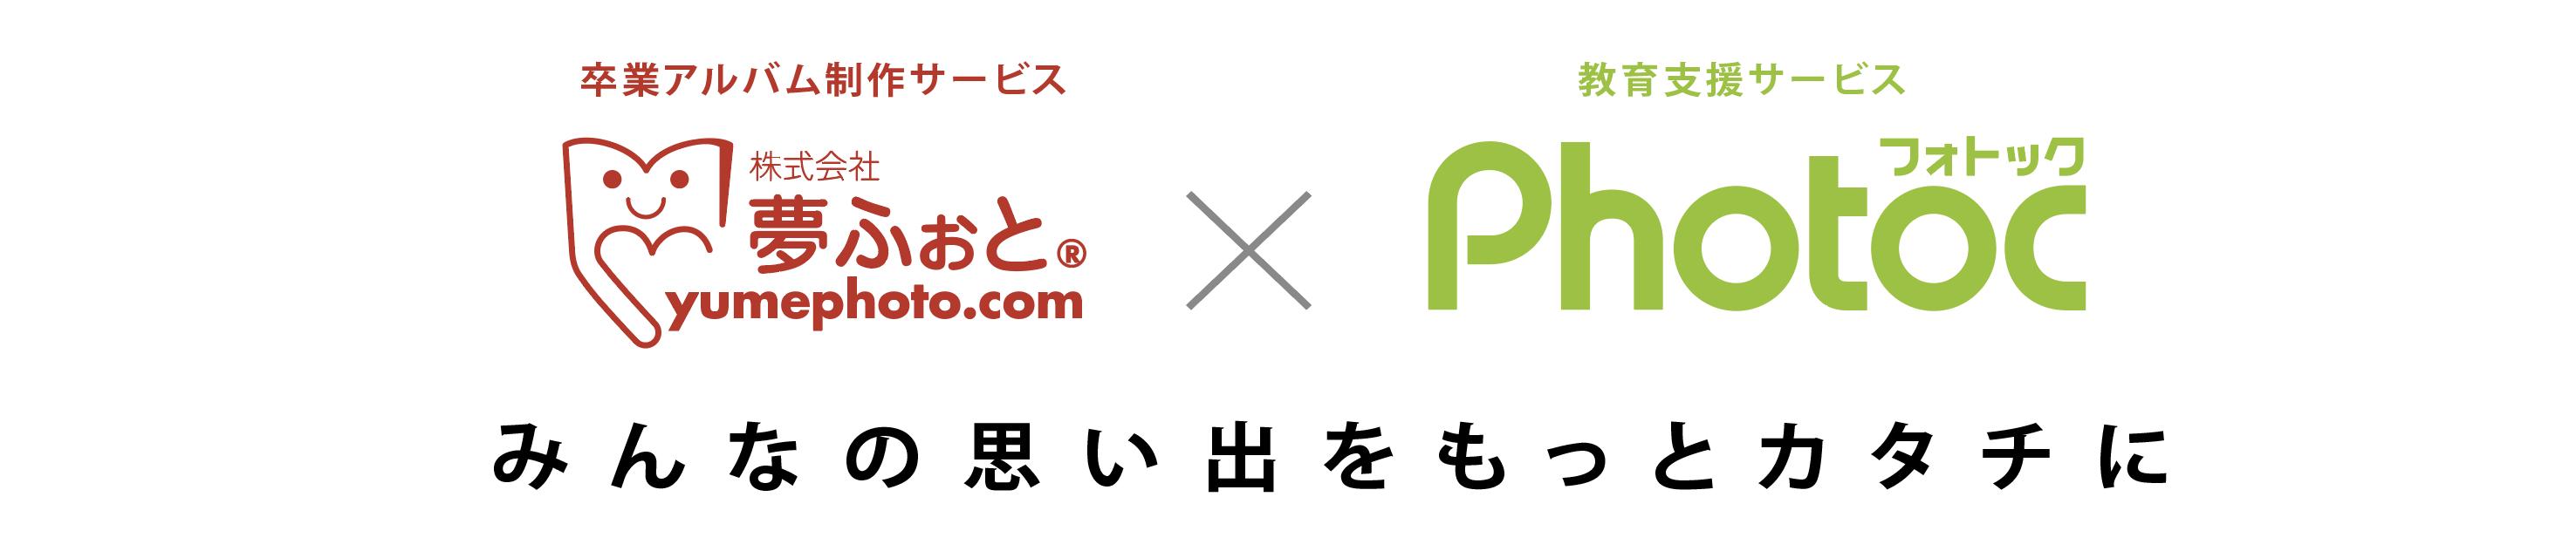 photoc業務提携